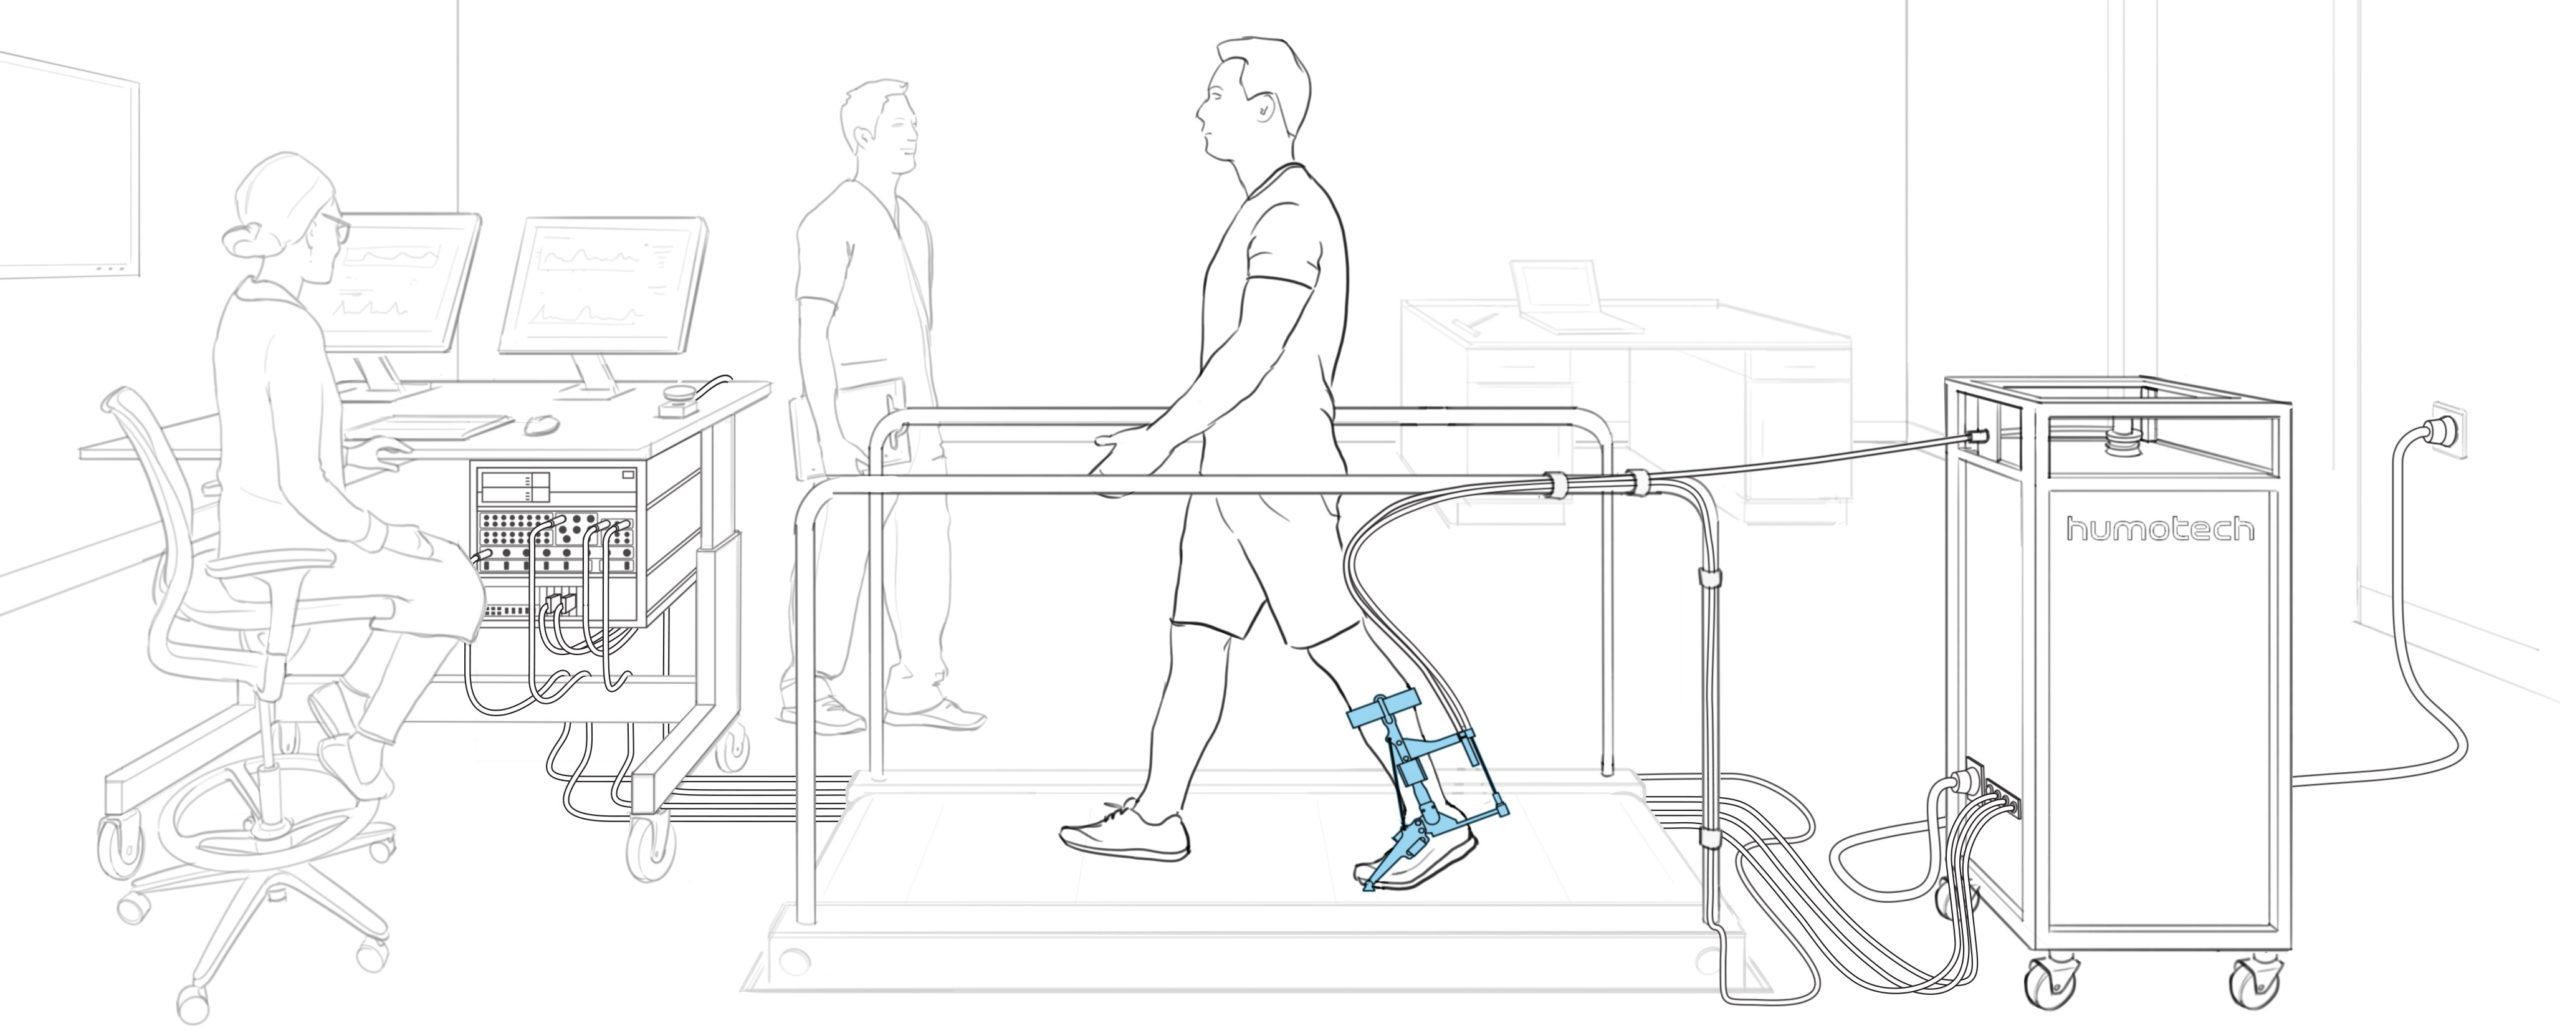 Full-Size Caplex System with EXO-001 Ankle Exoskeleton